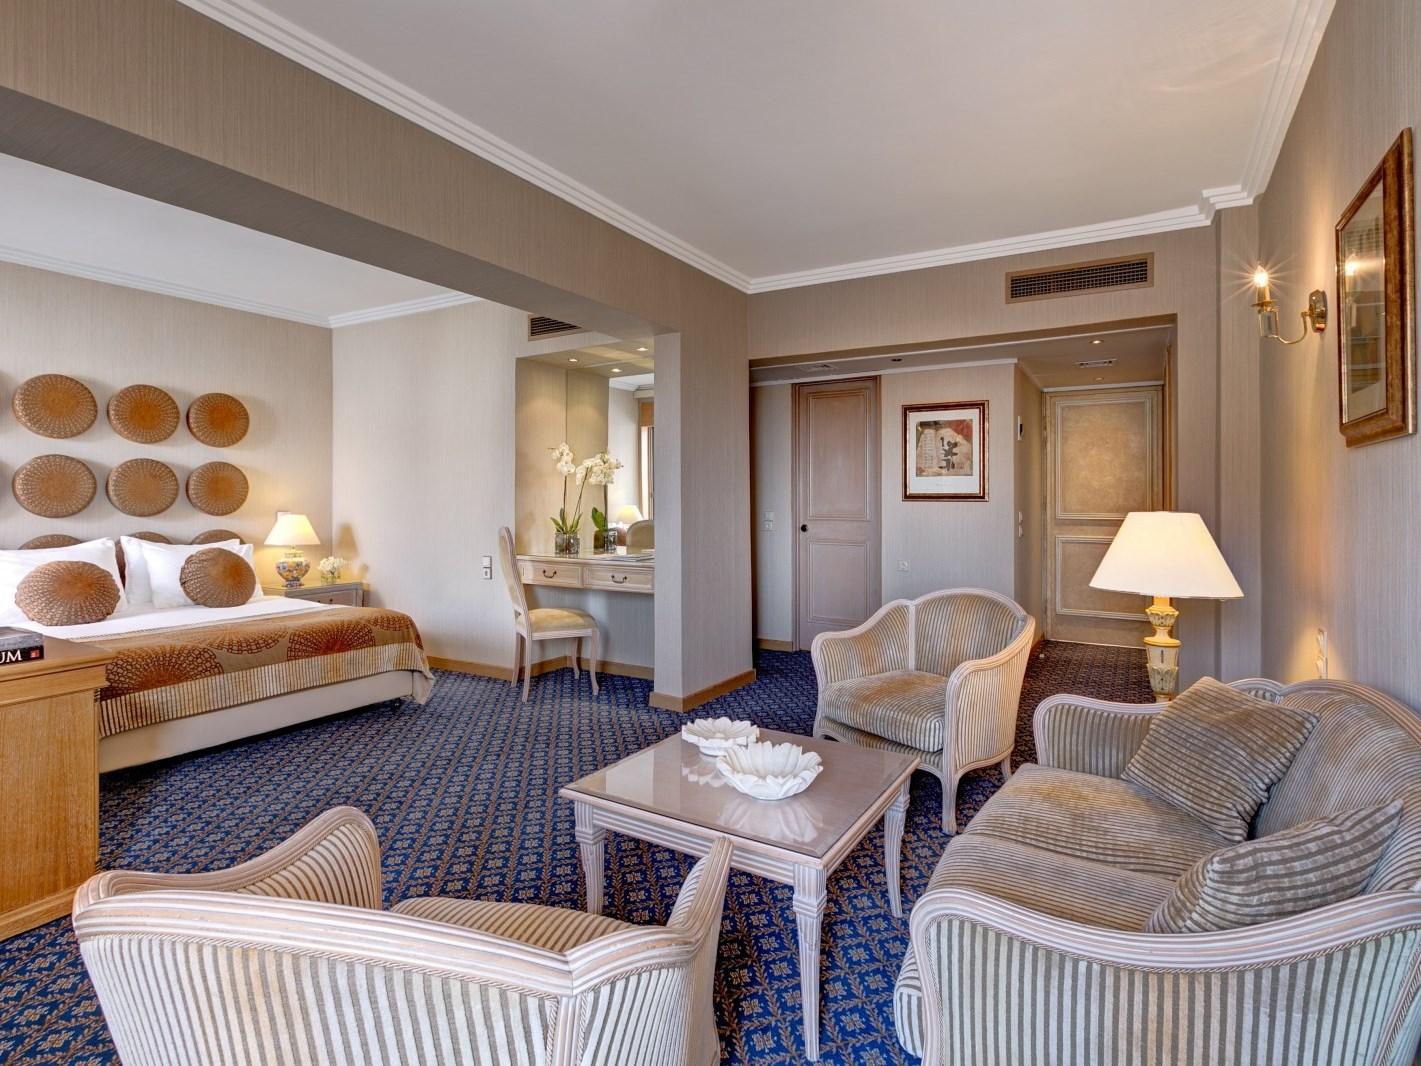 best price on divani palace acropolis hotel in athens. Black Bedroom Furniture Sets. Home Design Ideas